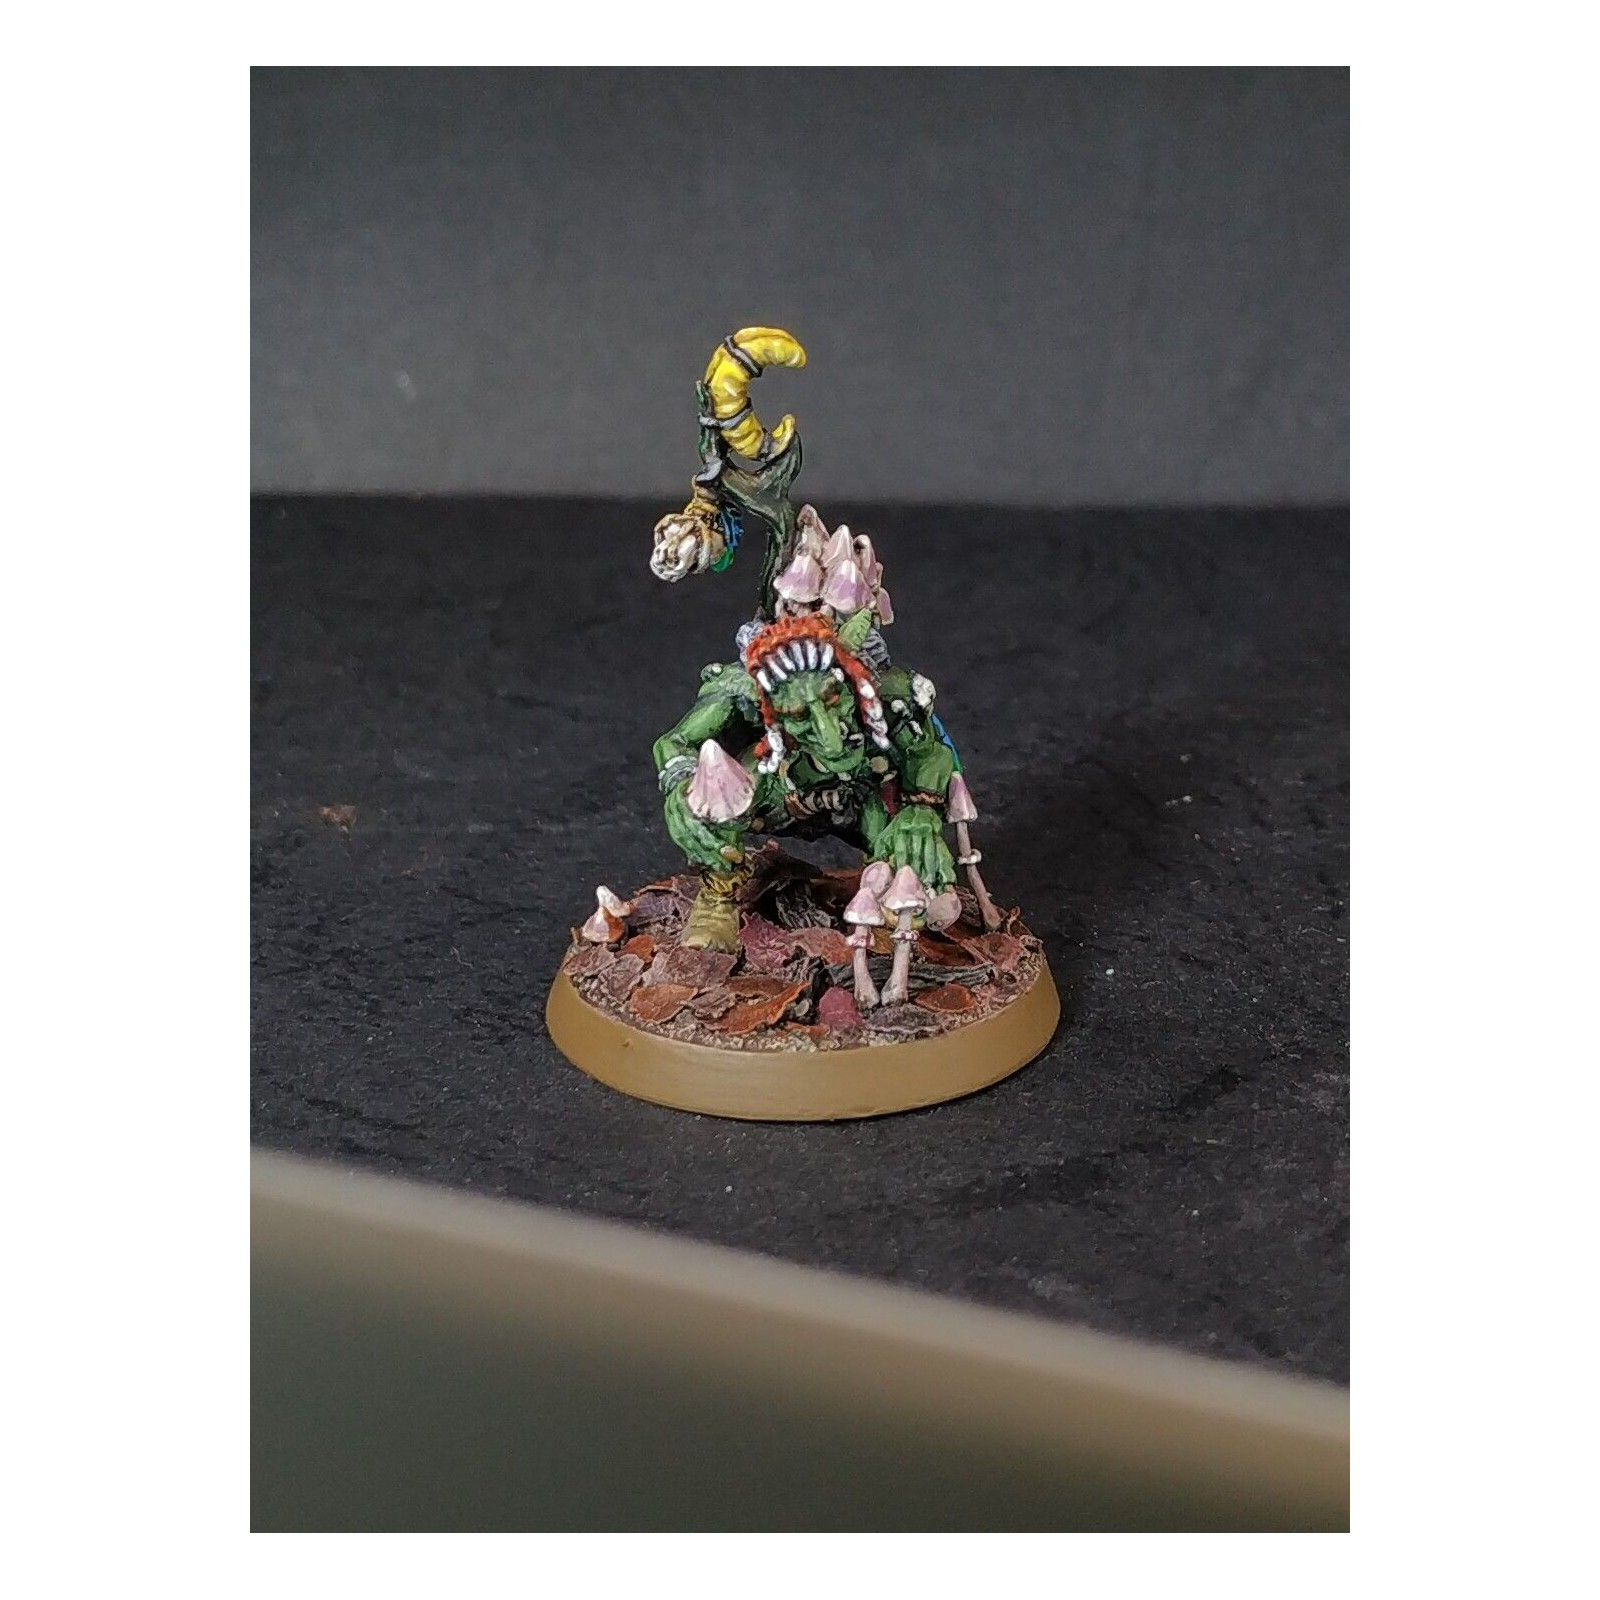 TinyBastards - Goblin shaman